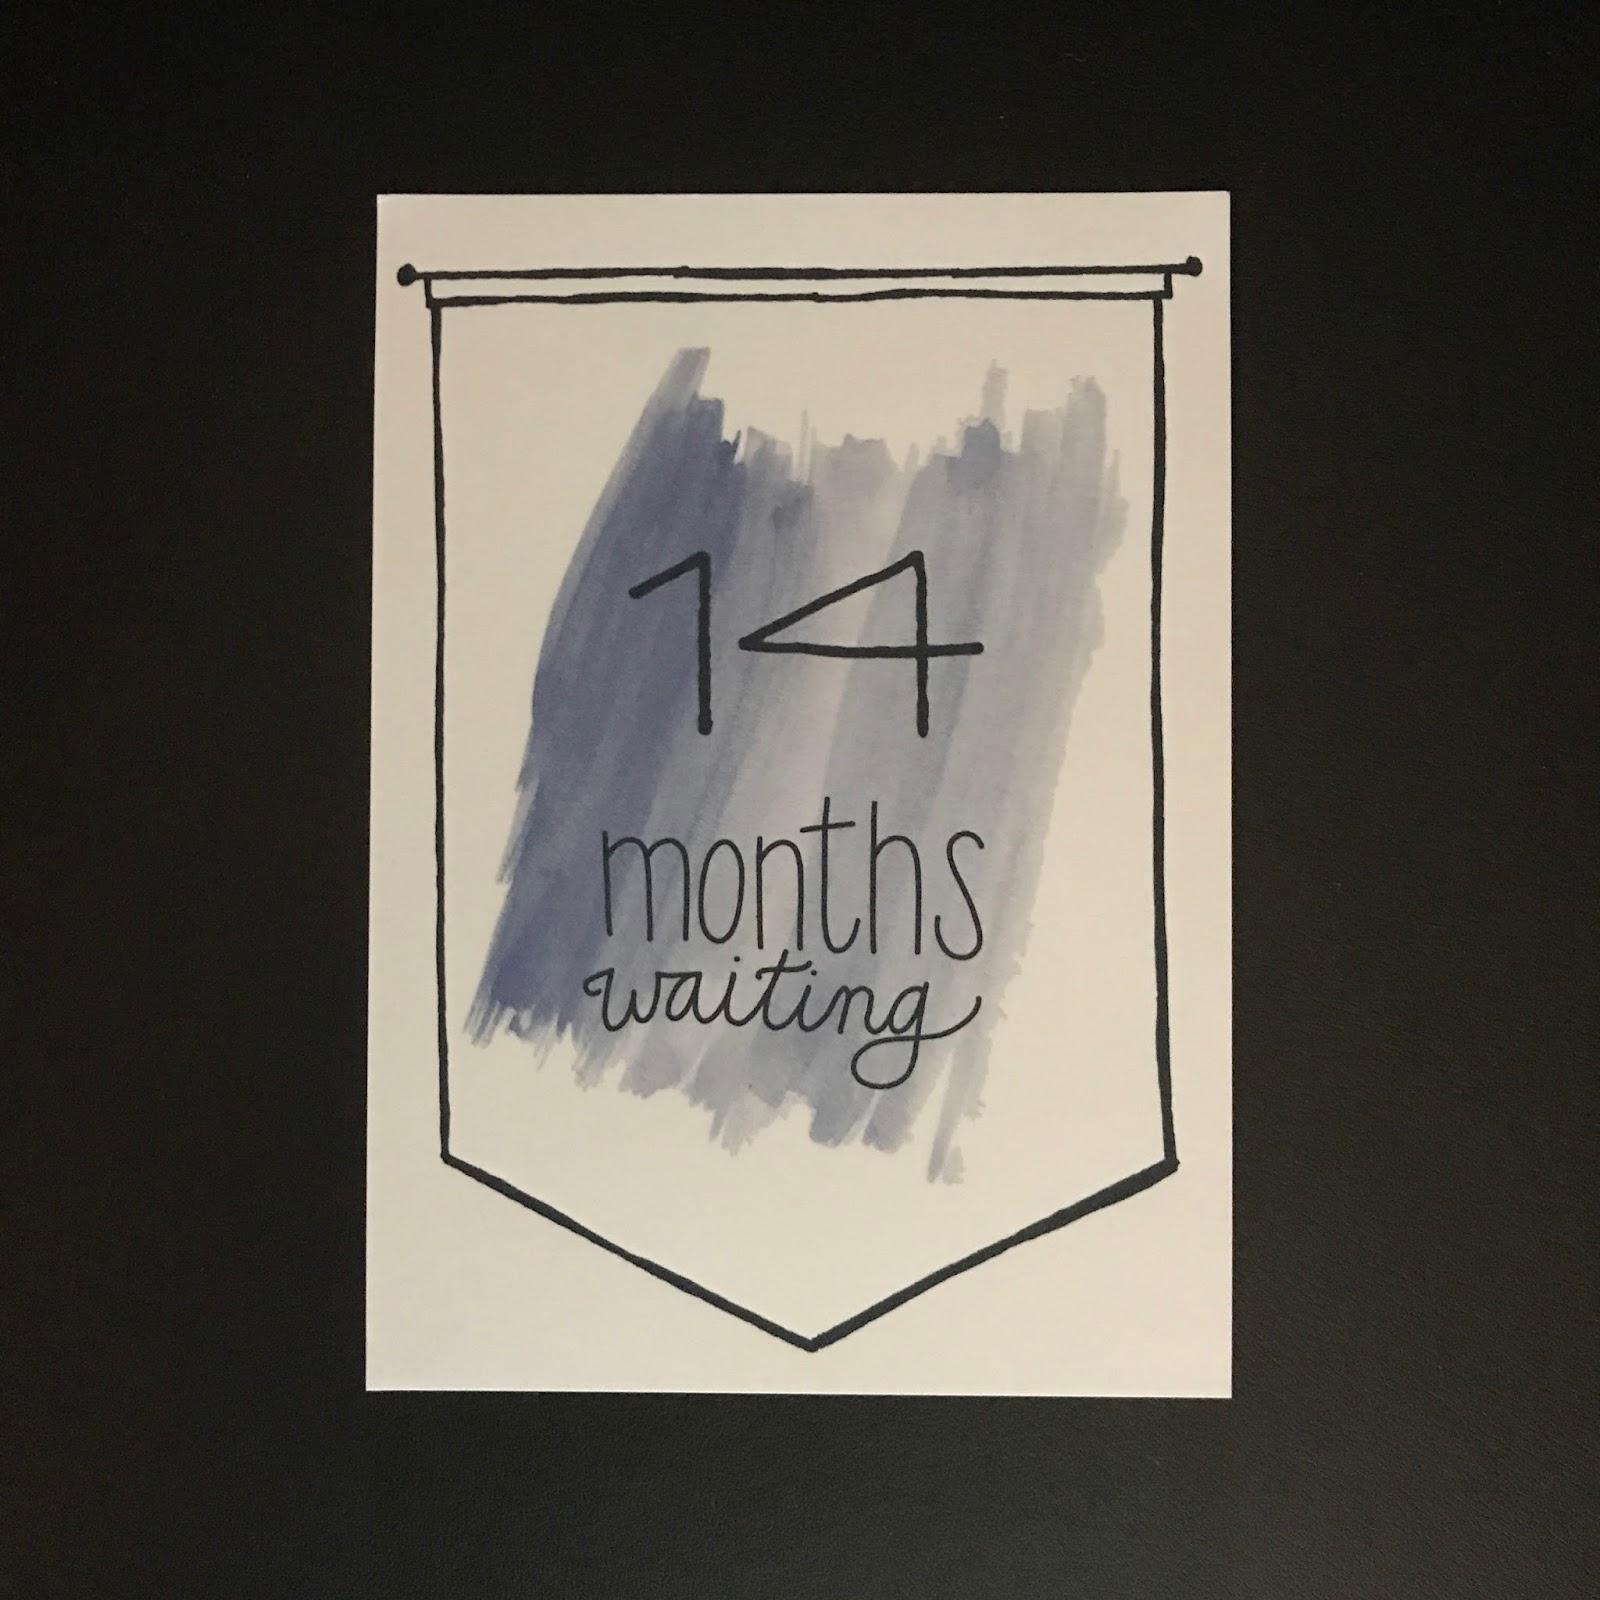 14 Months Waiting